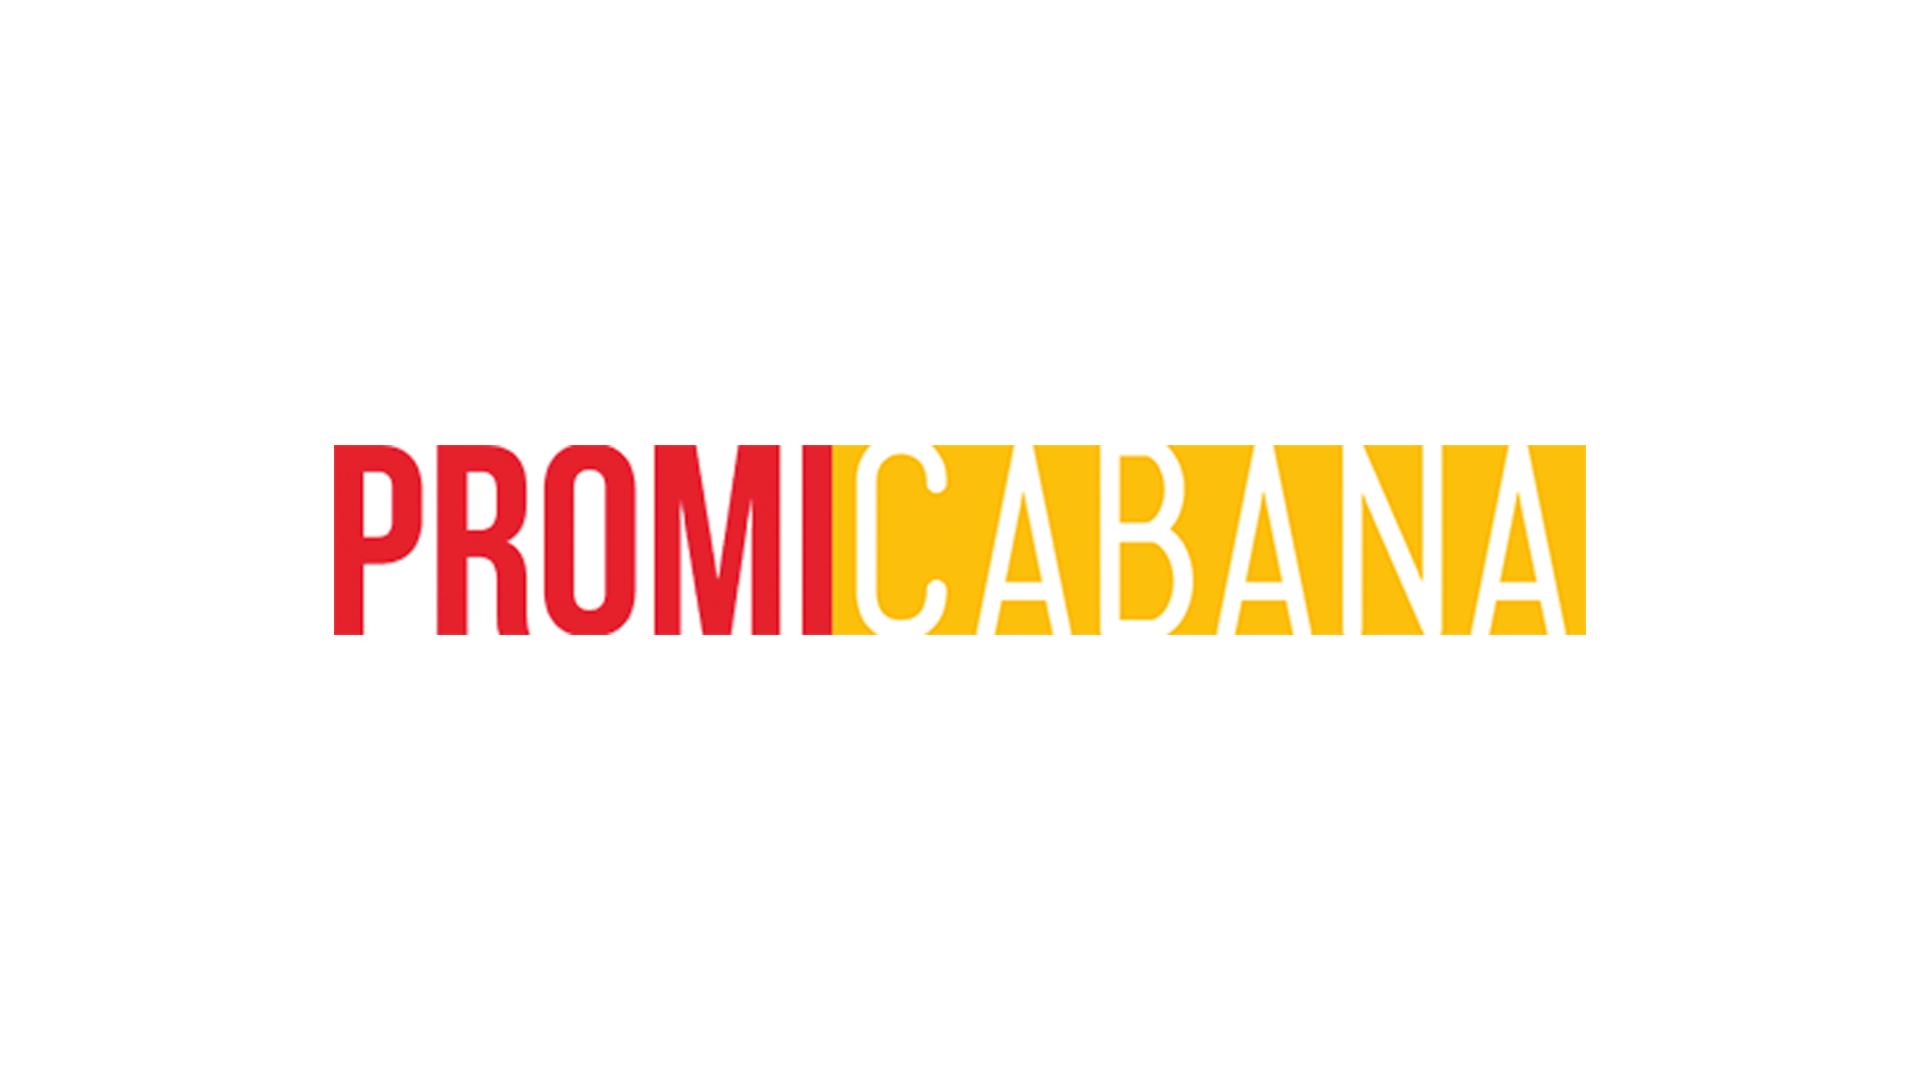 Miley-Cyrus-Jimmy-Fallon-Subway-Verkleidung